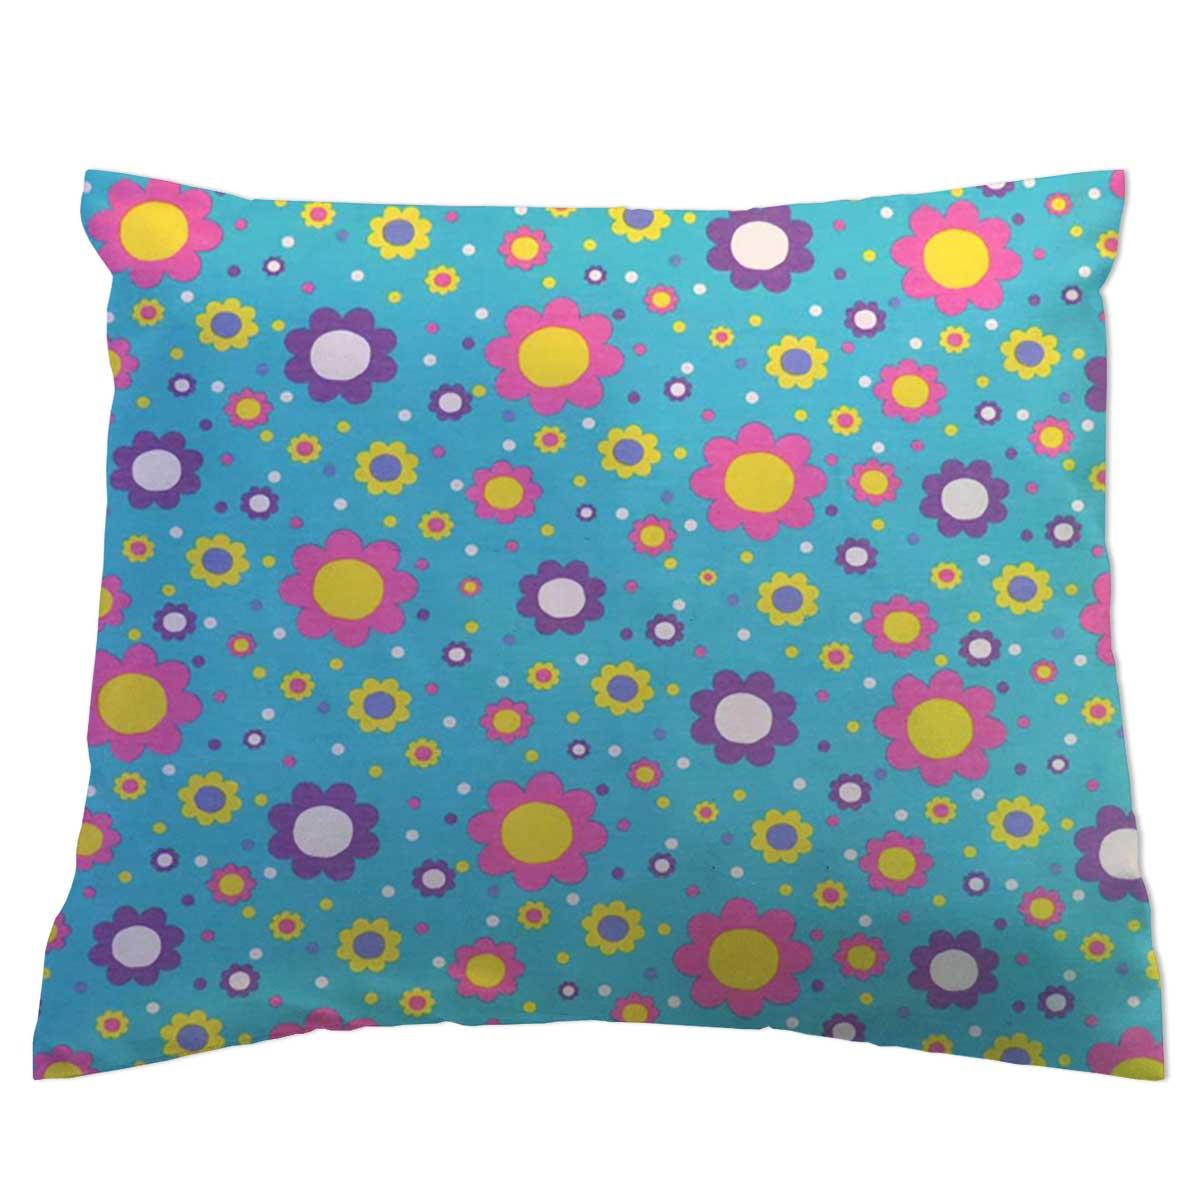 Twin Pillow Case Floral Aqua Jersey Knit Twin Pillow